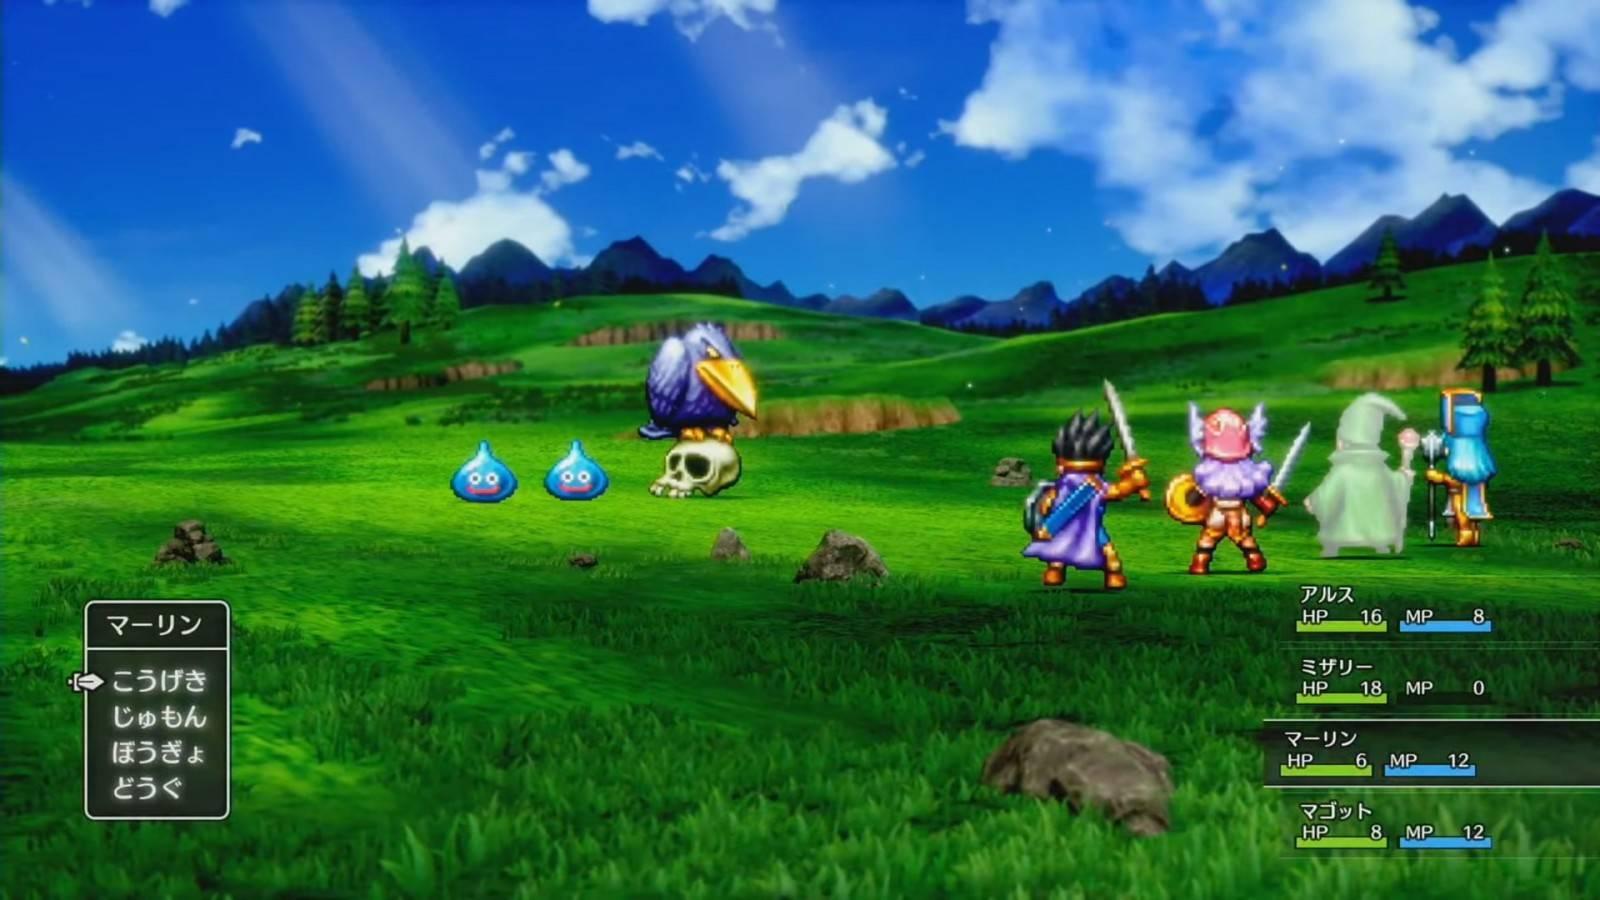 Square Enix anuncia 'Dragon Quest X Offline' para Nintendo Switch 1